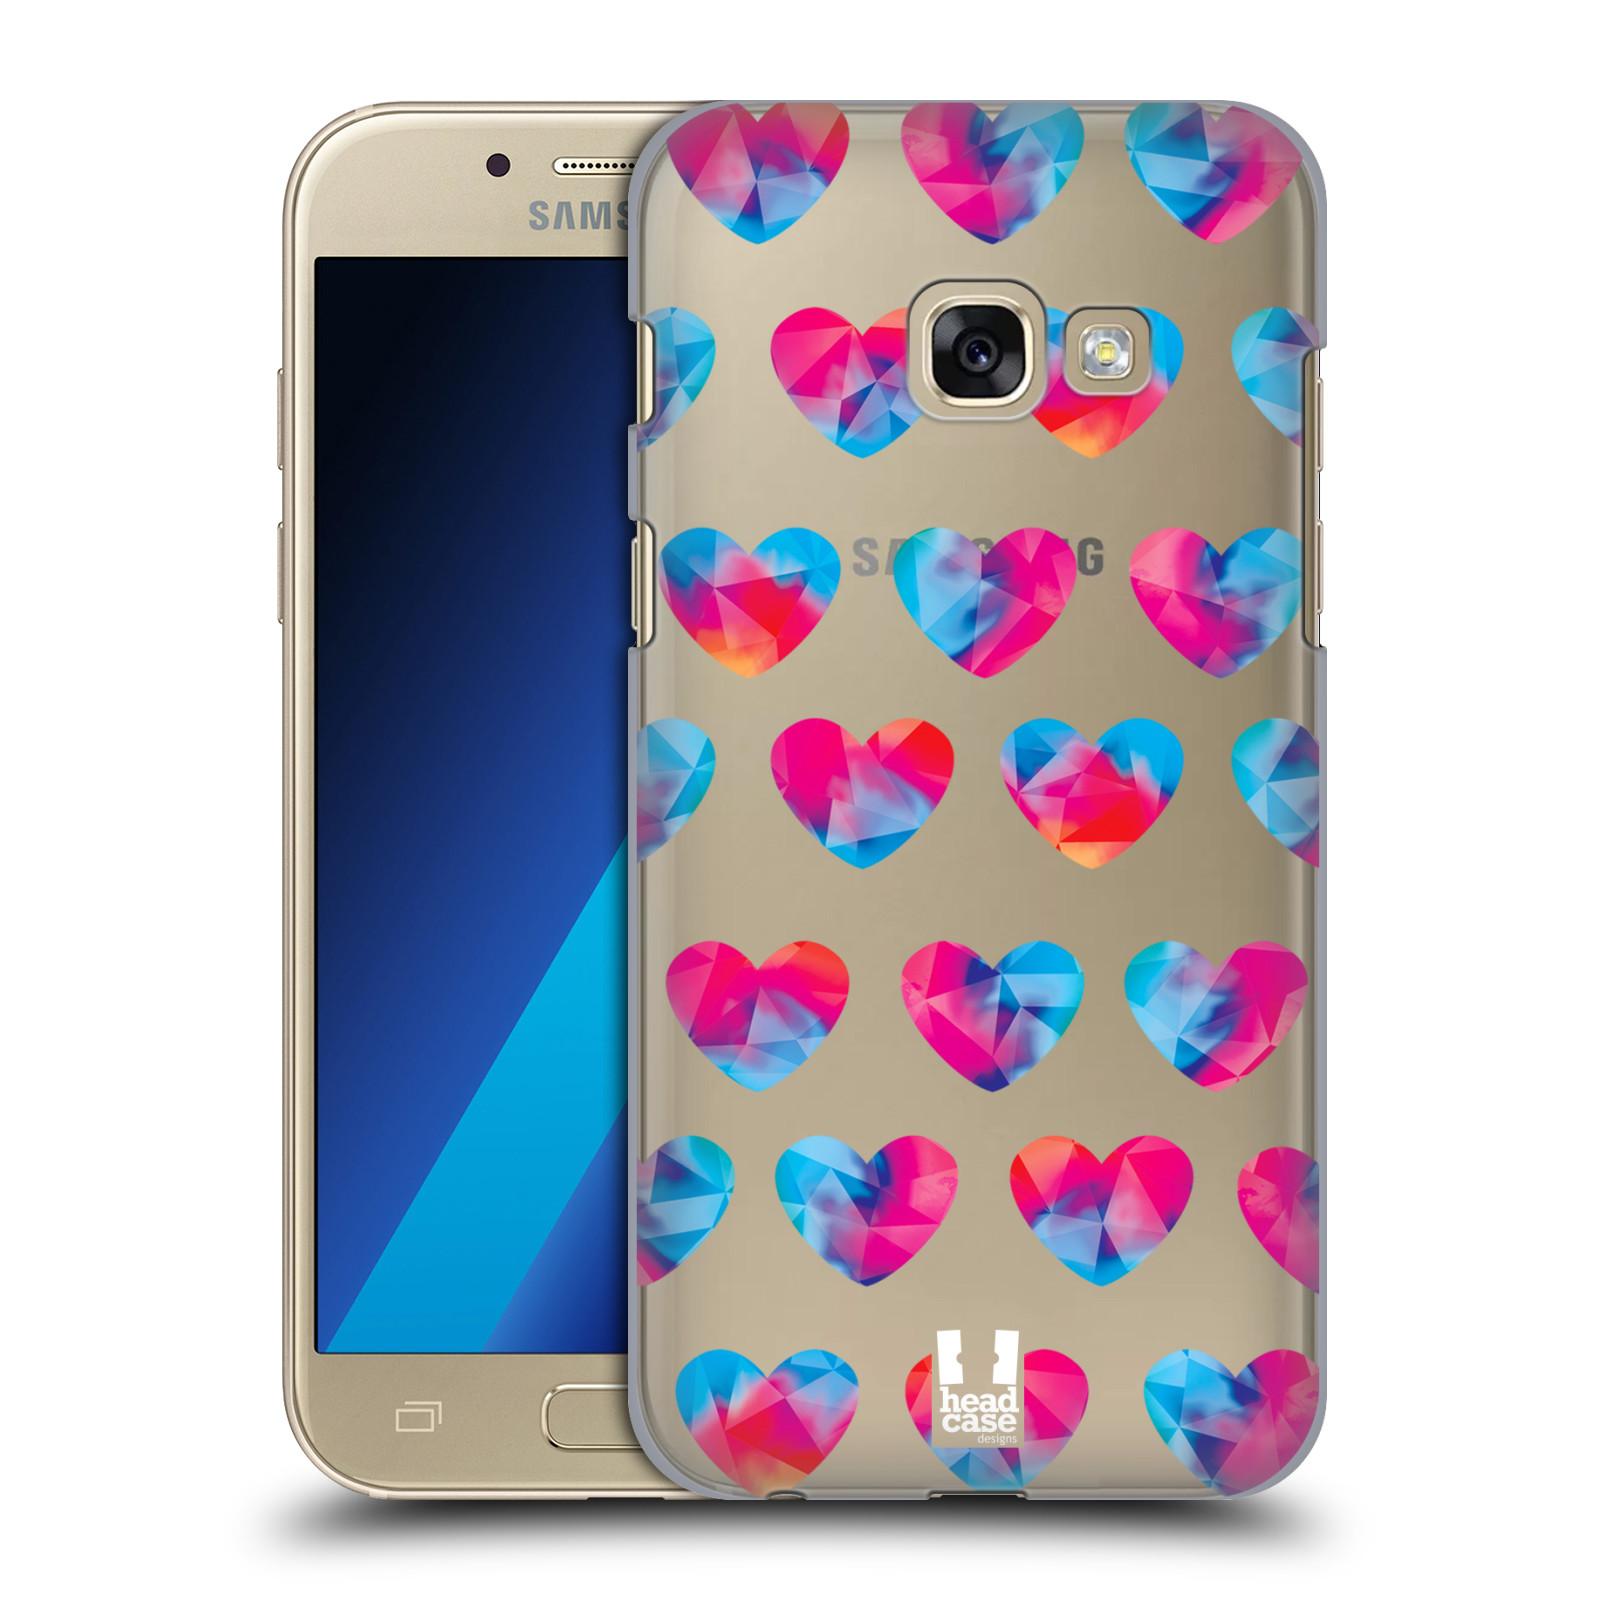 Plastové pouzdro na mobil Samsung Galaxy A3 (2017) - Head Case - Srdíčka hrající barvami